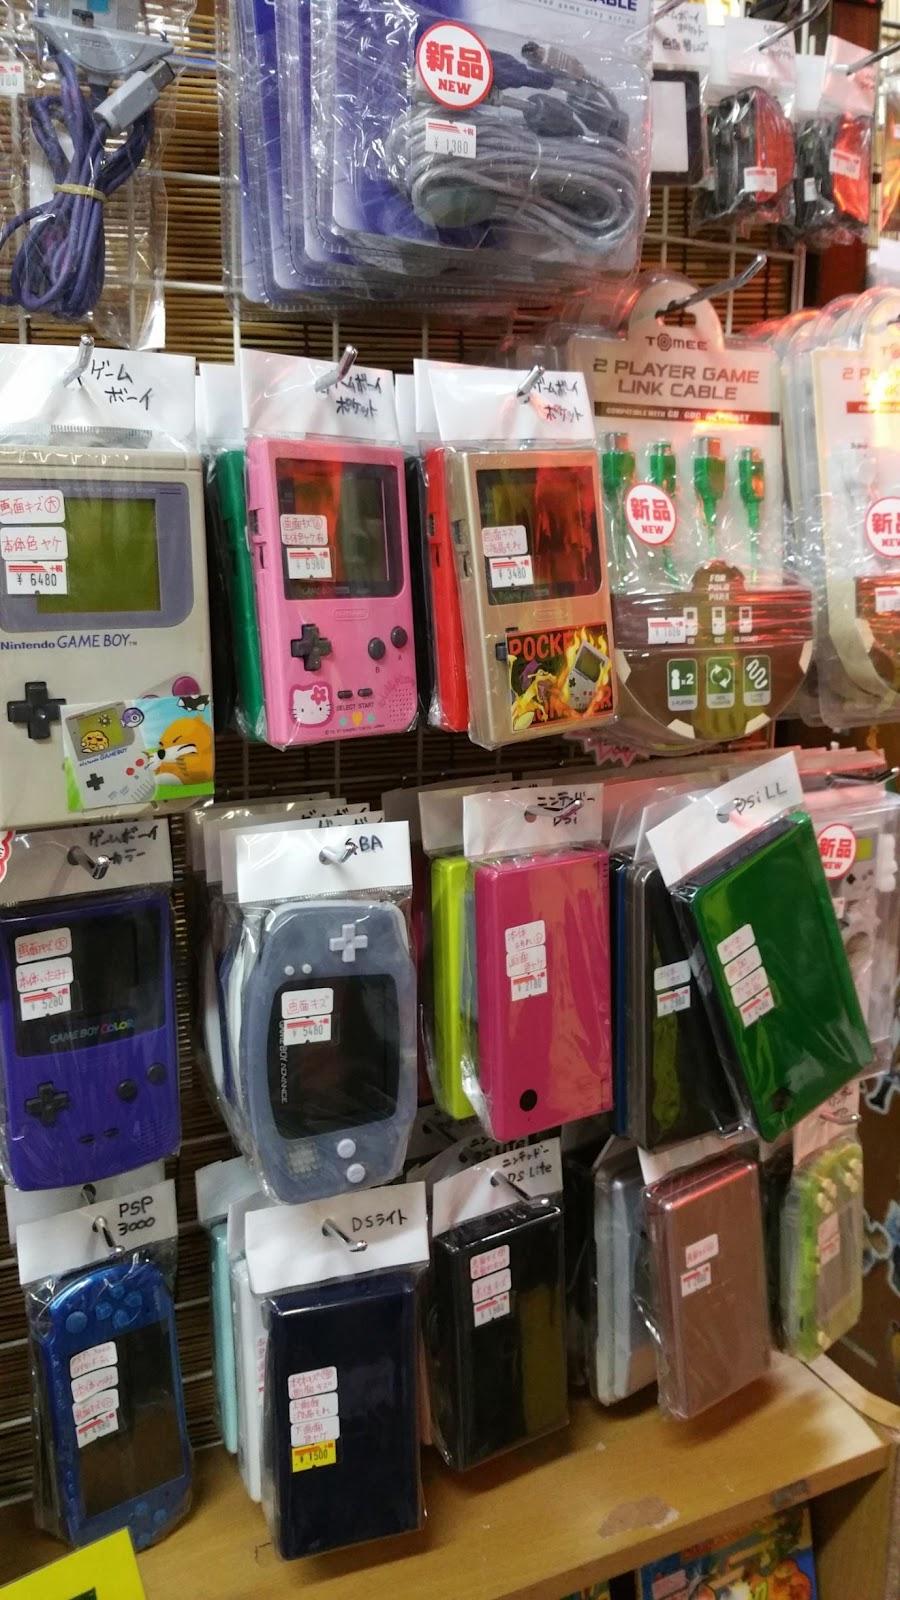 C:\Users\J\Pictures\TOKYO NOV 2016\SUPER POTATO\20161117_155731.jpg